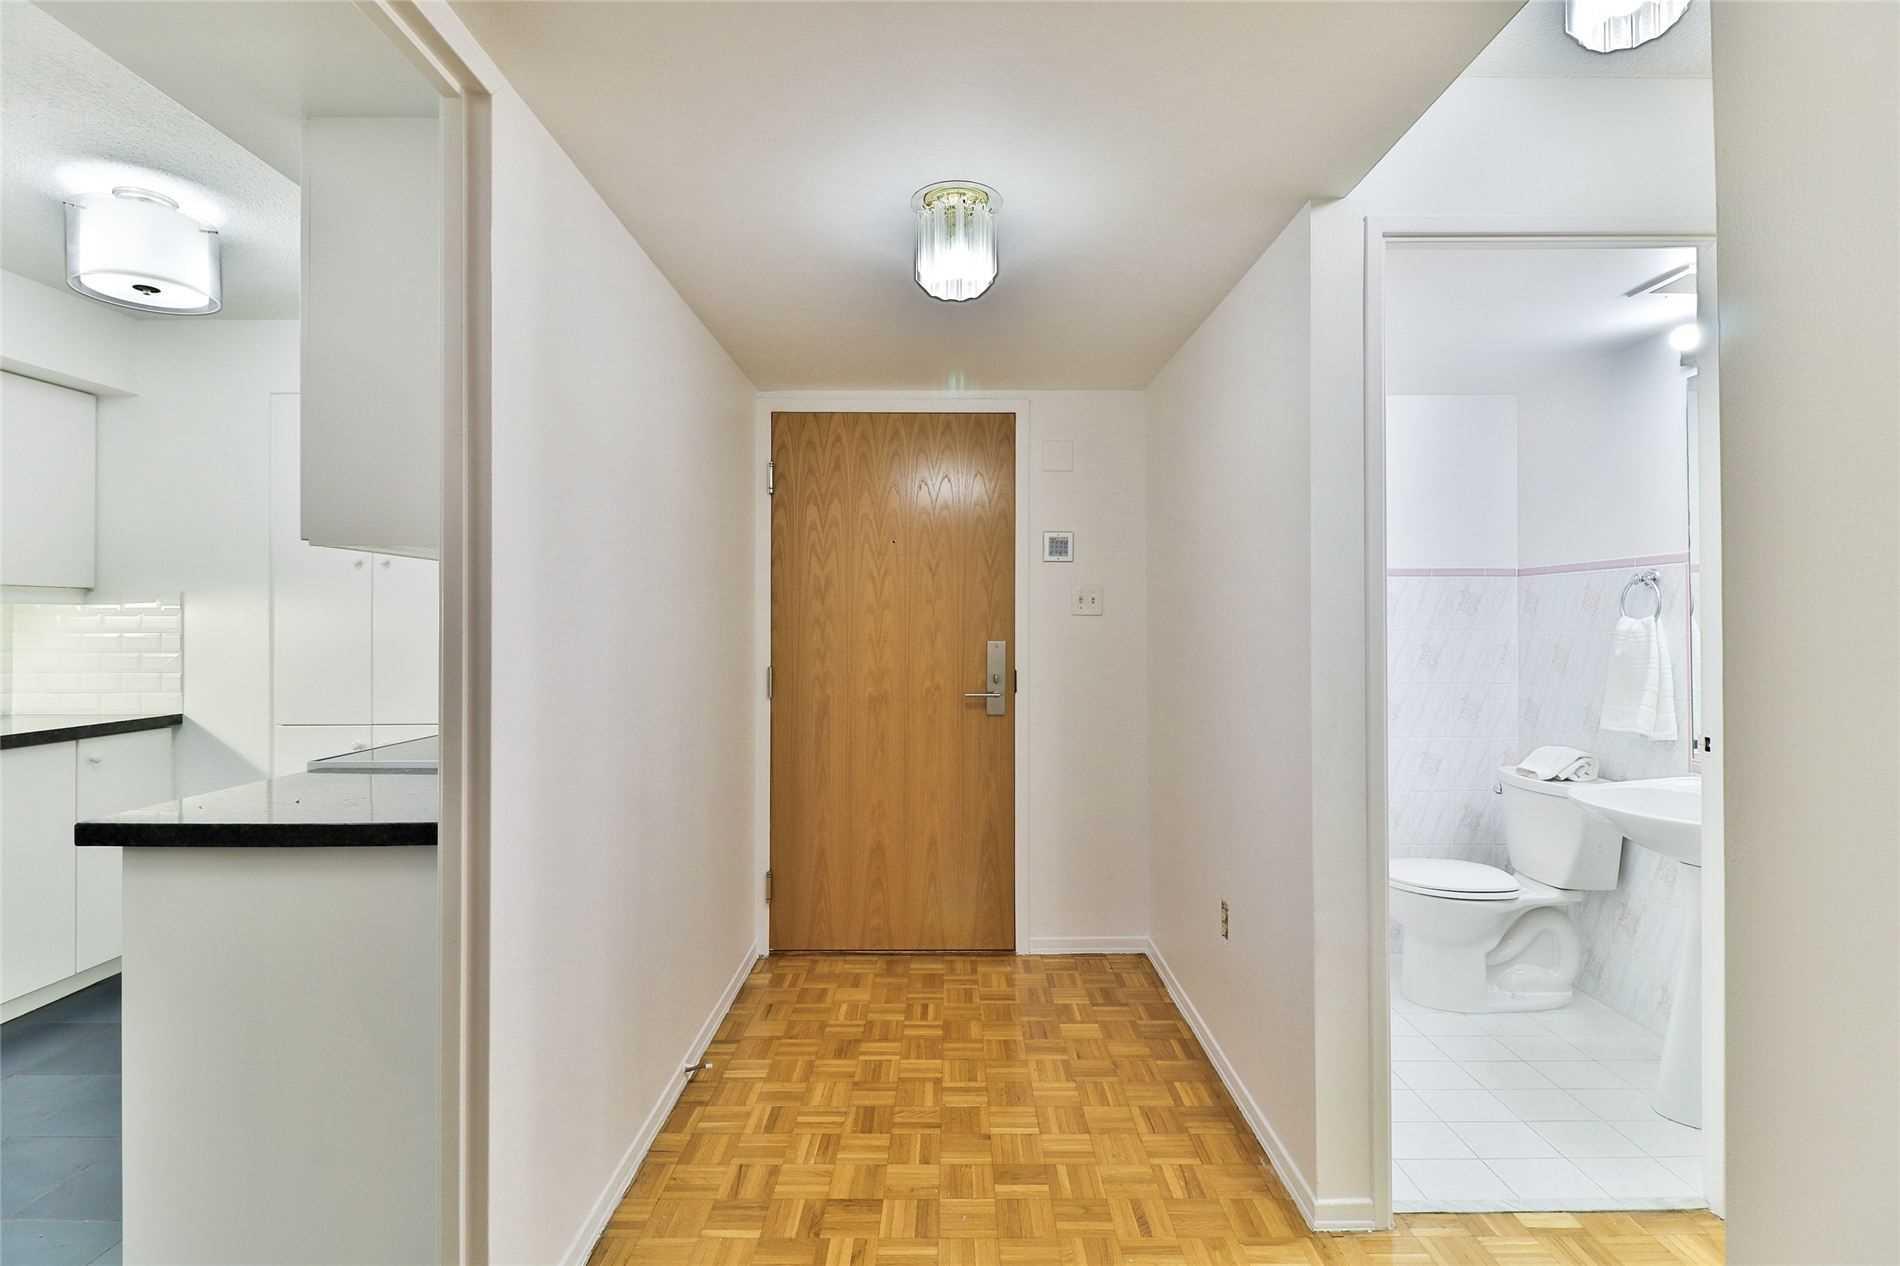 304 - 35 Church St - Church-Yonge Corridor Condo Apt for sale, 1 Bedroom (C5399330) - #17